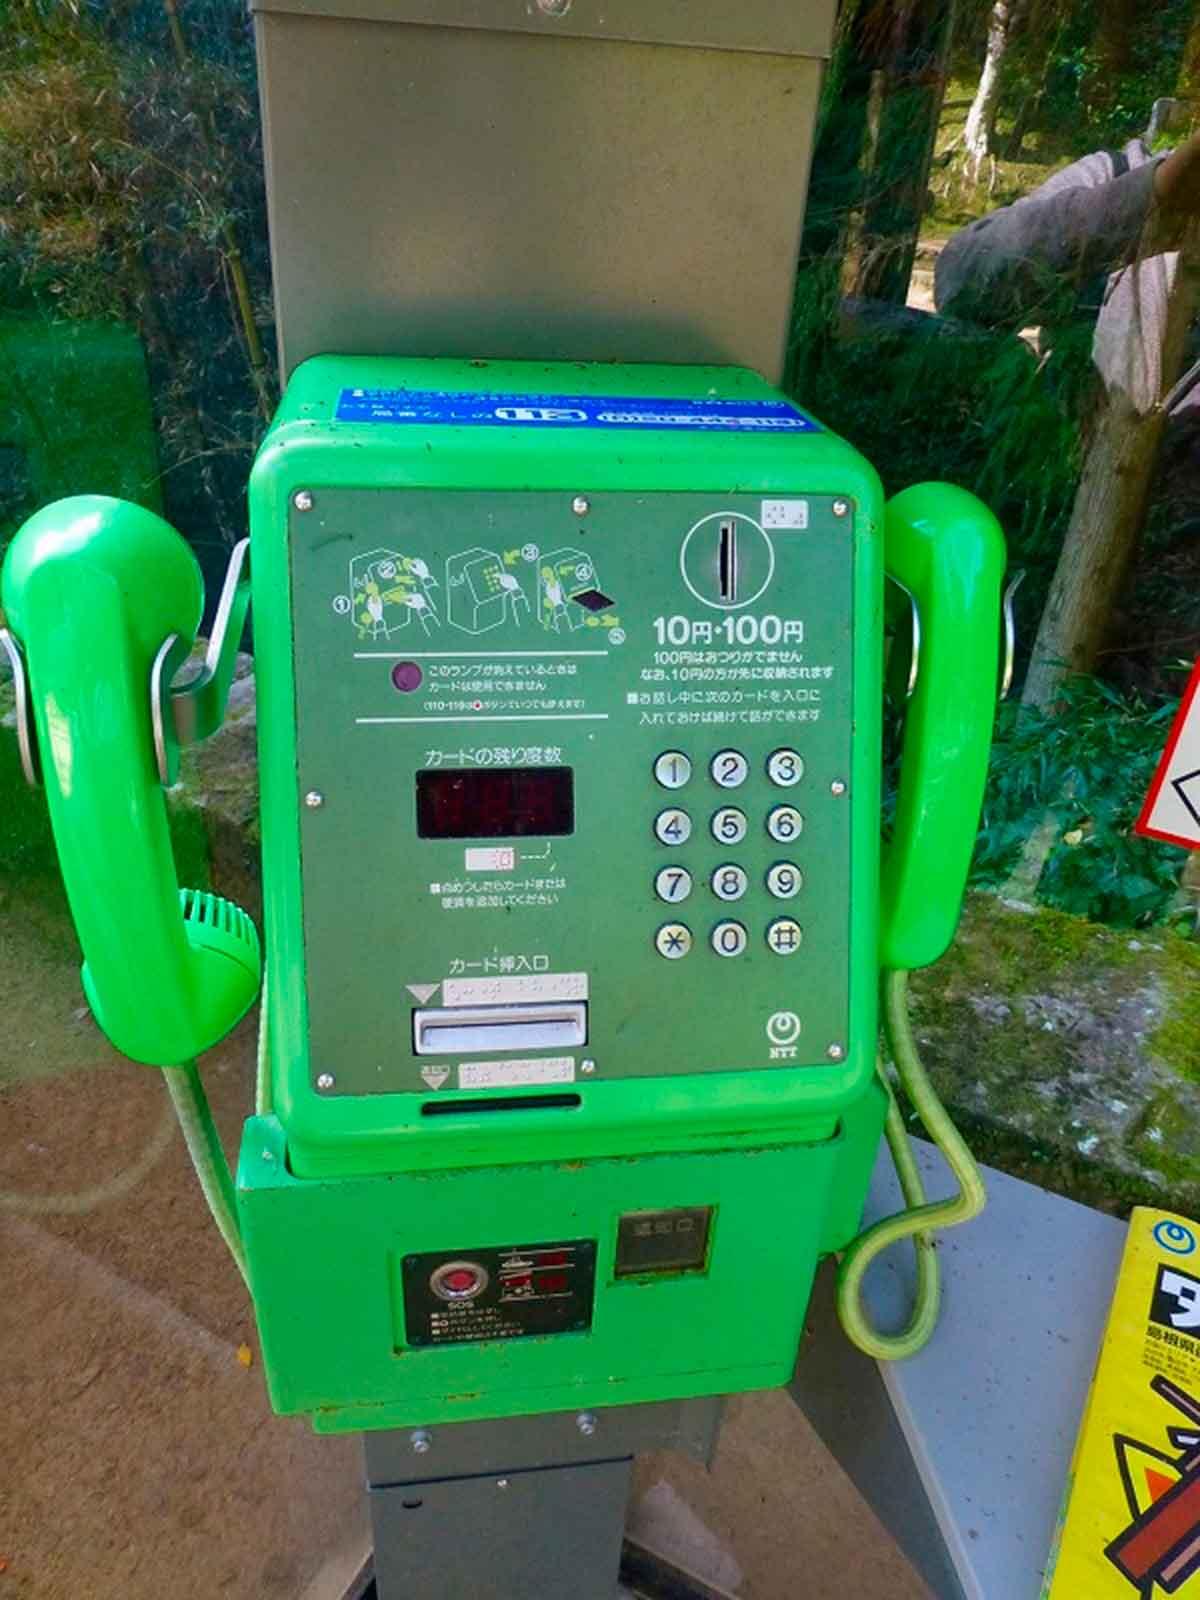 電話 受話器 公衆 二 つ